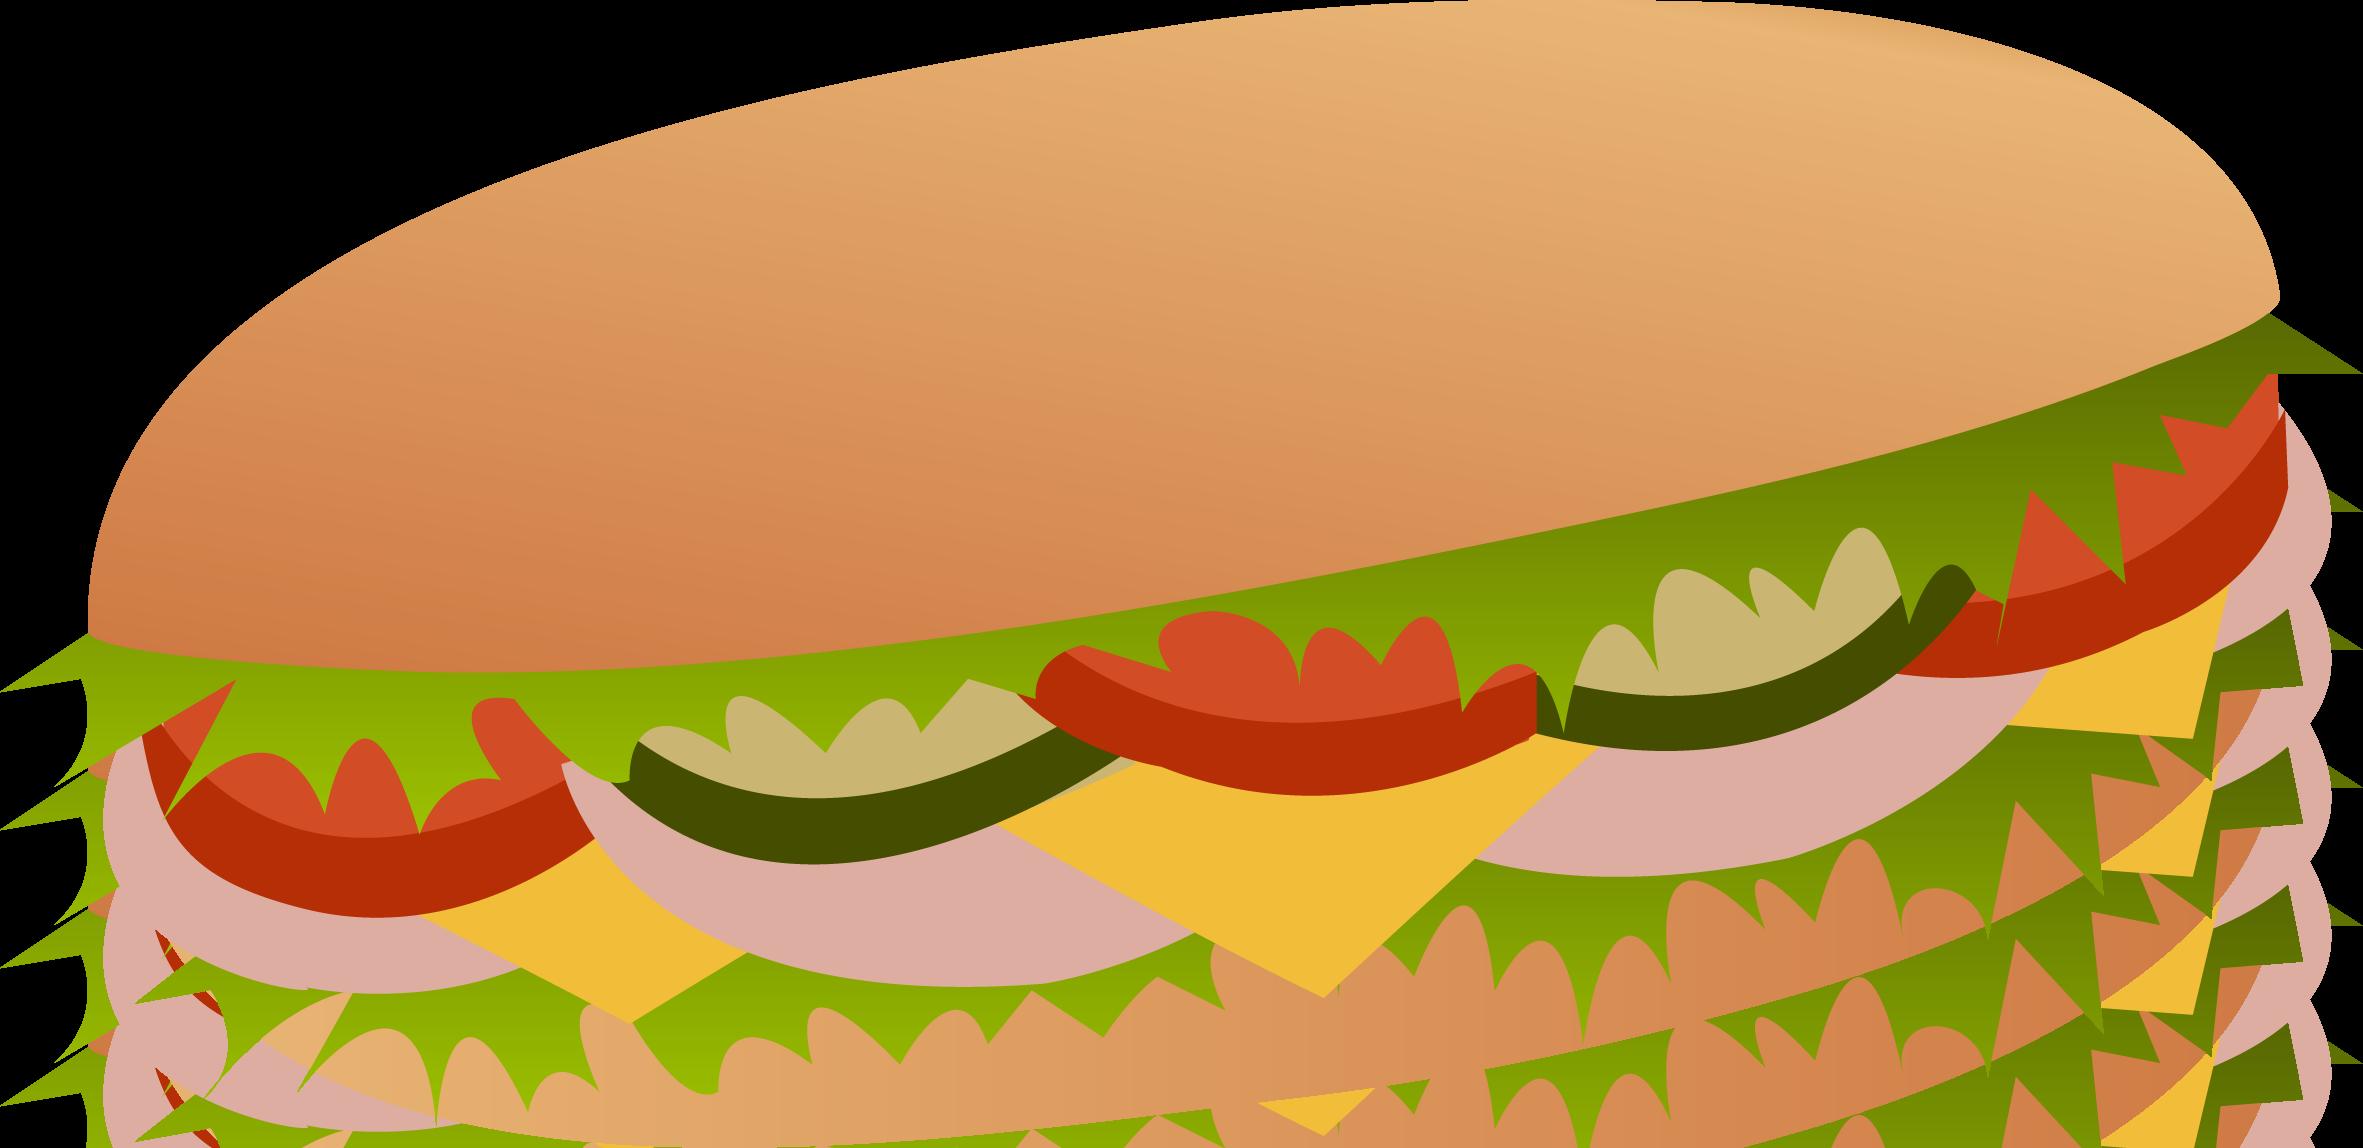 Fractions illustration